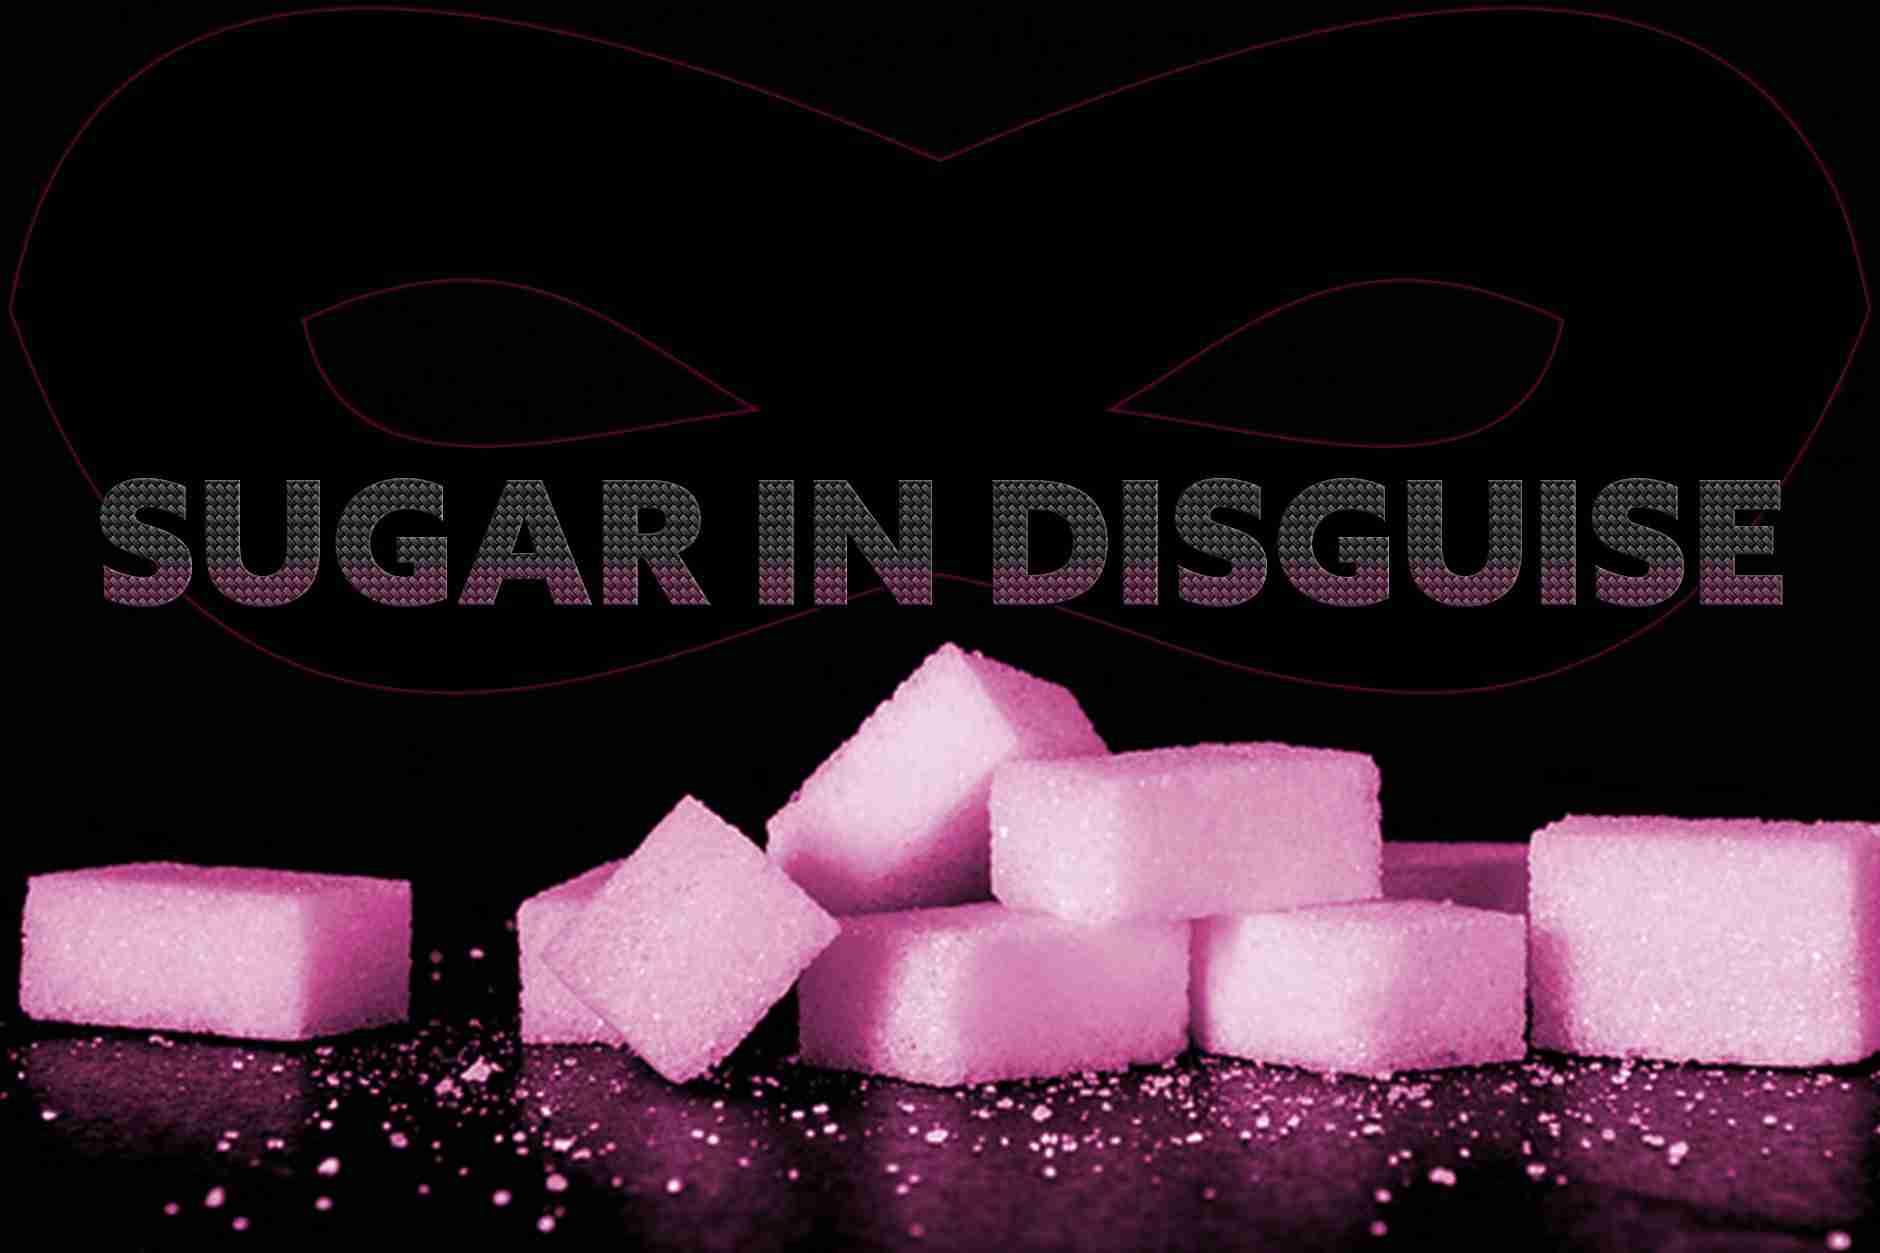 Sugar in disguise - popular names for sugar